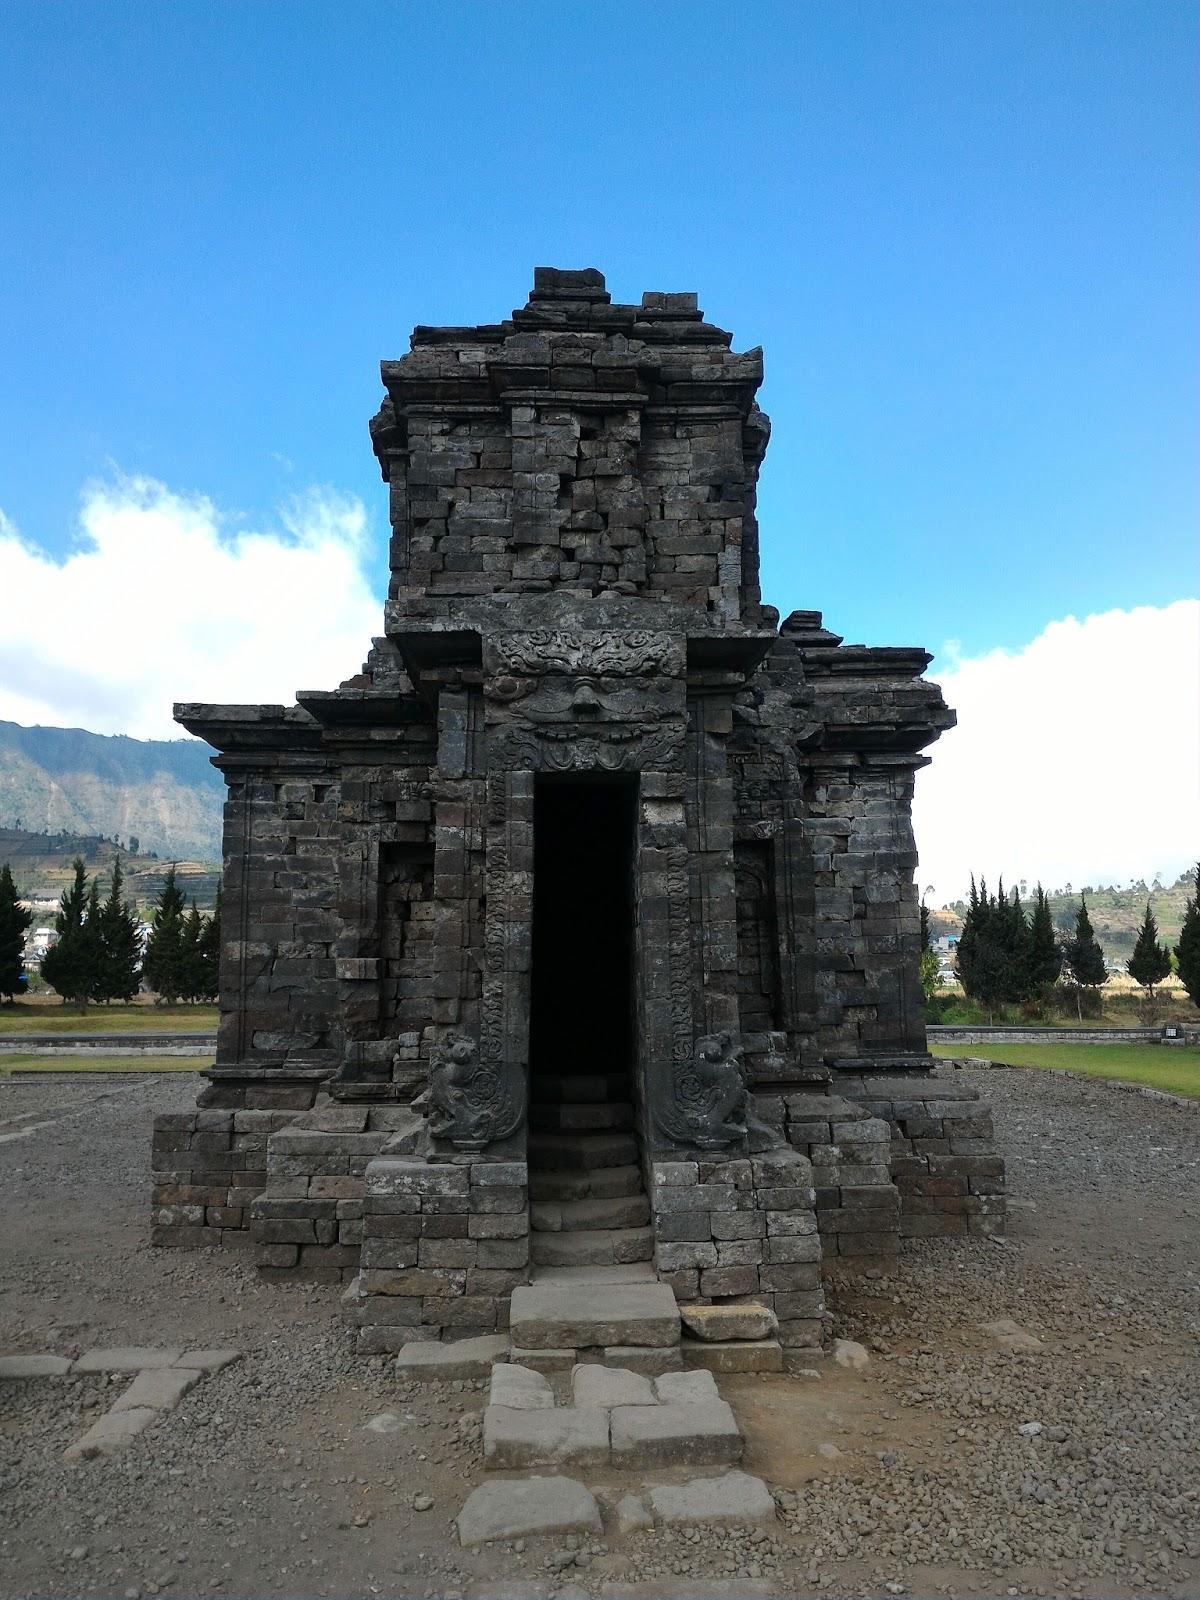 Candi Sembrada Dataran Tinggi Dieng Komplek Percandian Arjuna Kab Banjarnegara